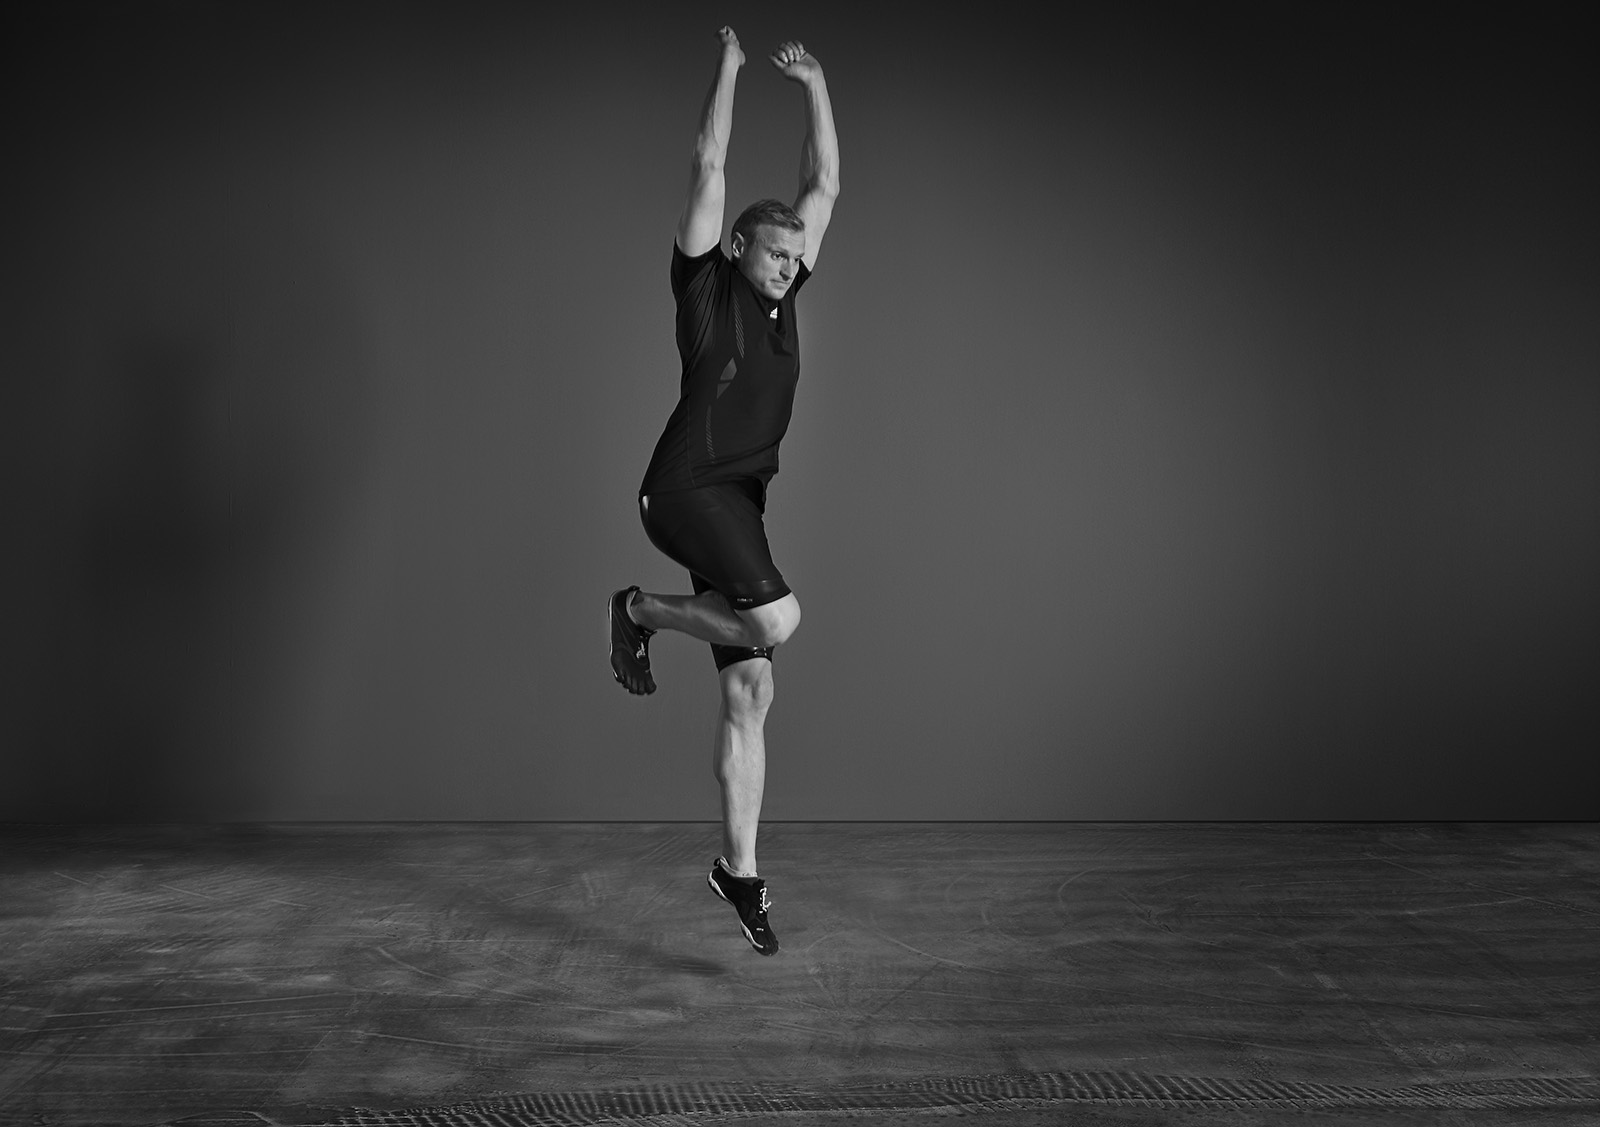 patrick-schreiber-Personal-Training-jump-up